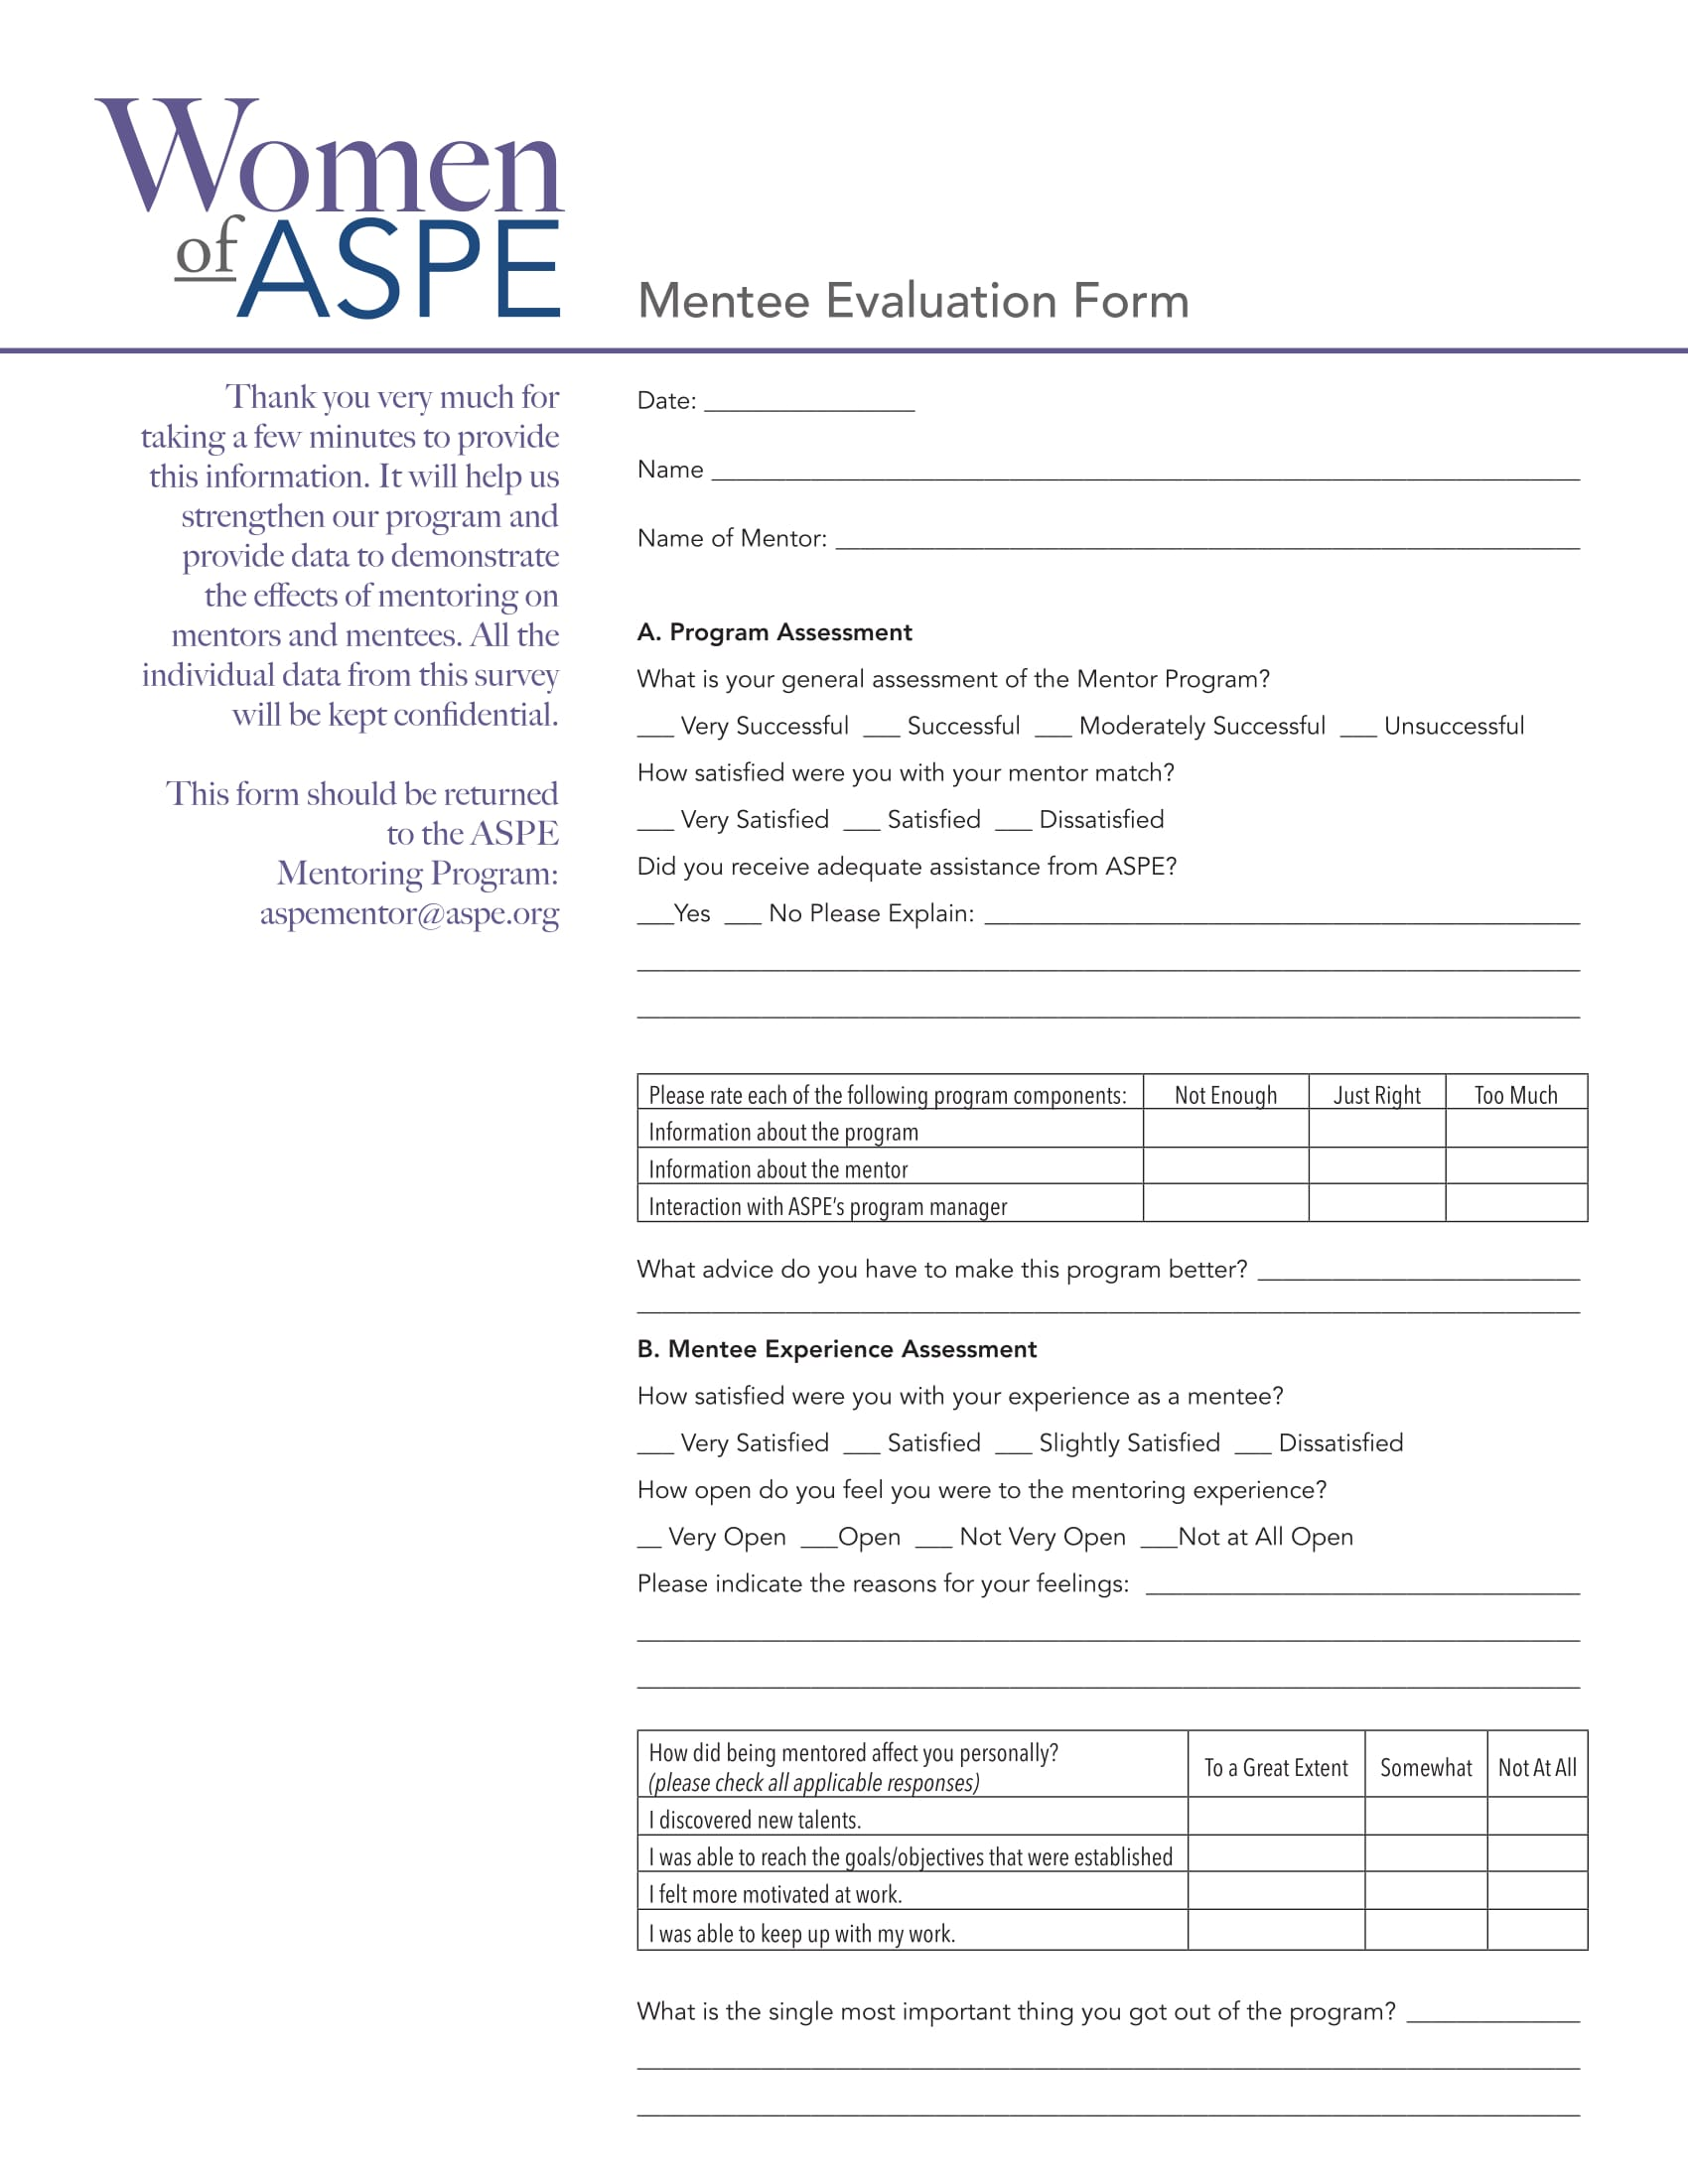 mentee assessment evaluation form 1